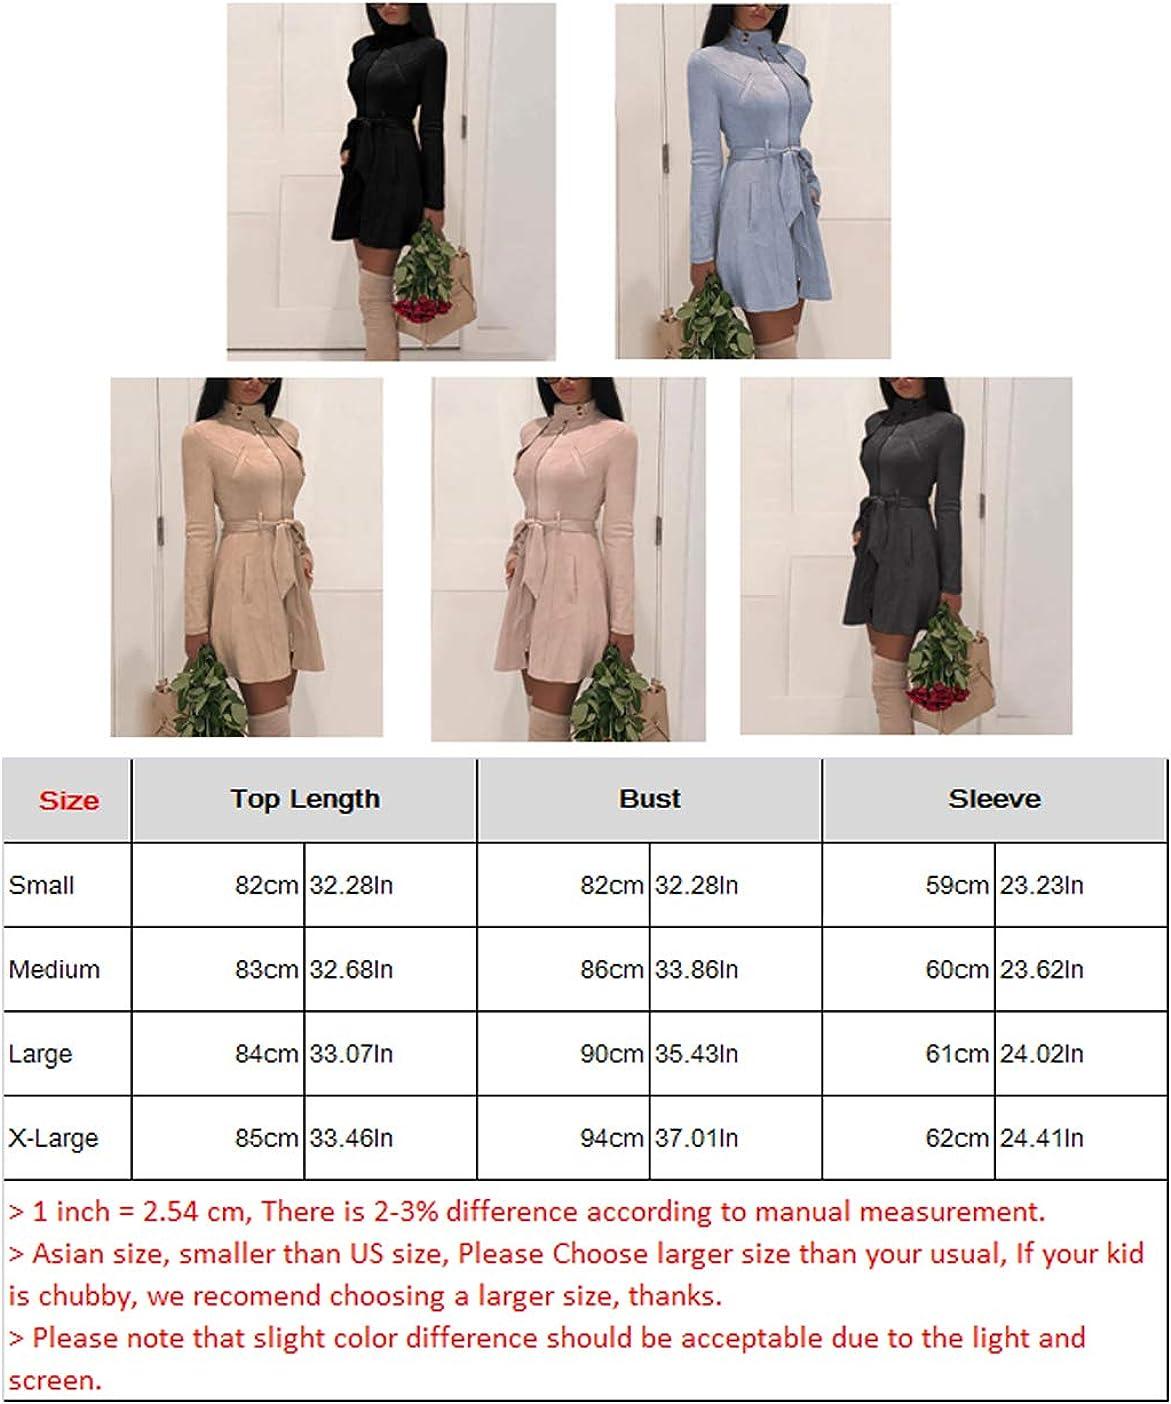 Suesung Women Hooded Medium Length Trench Coat High Neck Long Sleeve Belted Overcoat